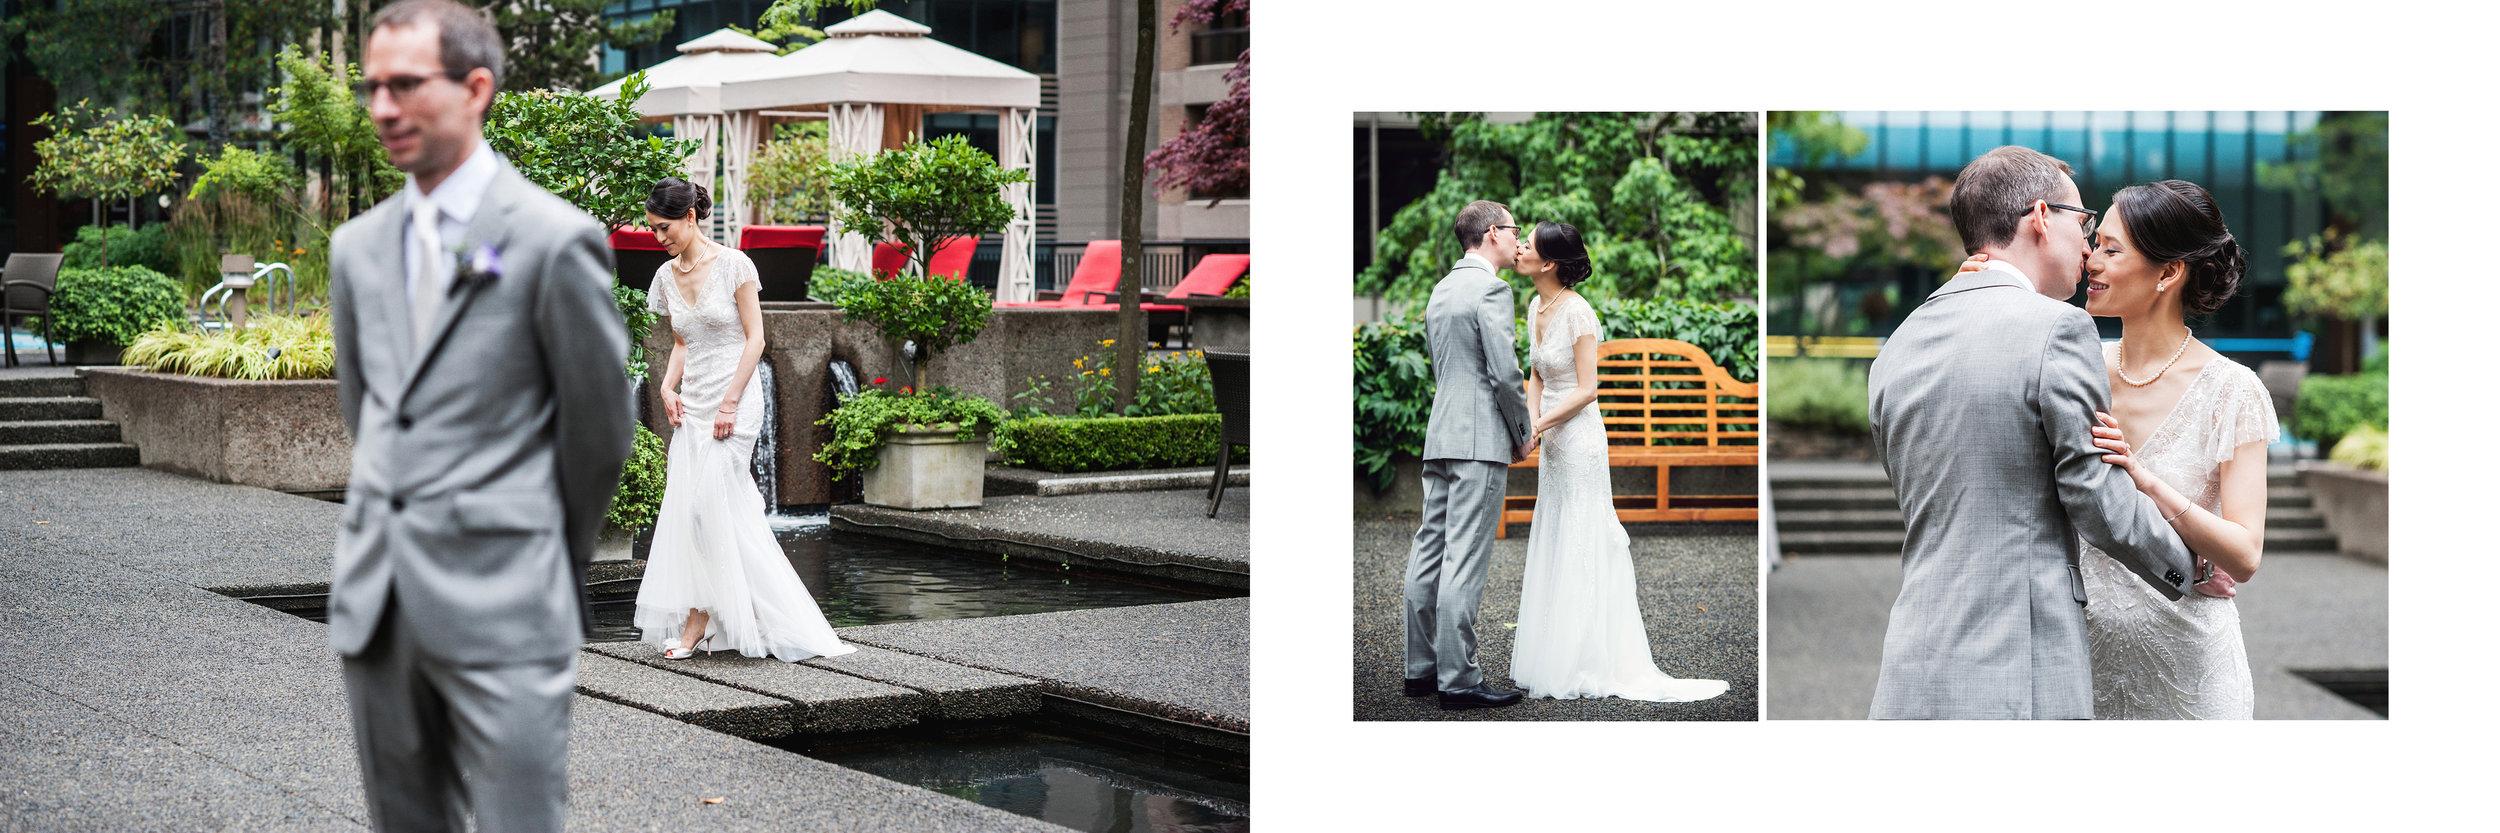 Andrea-Reuben-Grouse-Mountain-Wedding-Real-Weddings-Feature-Yaletown-Photography-006.jpg